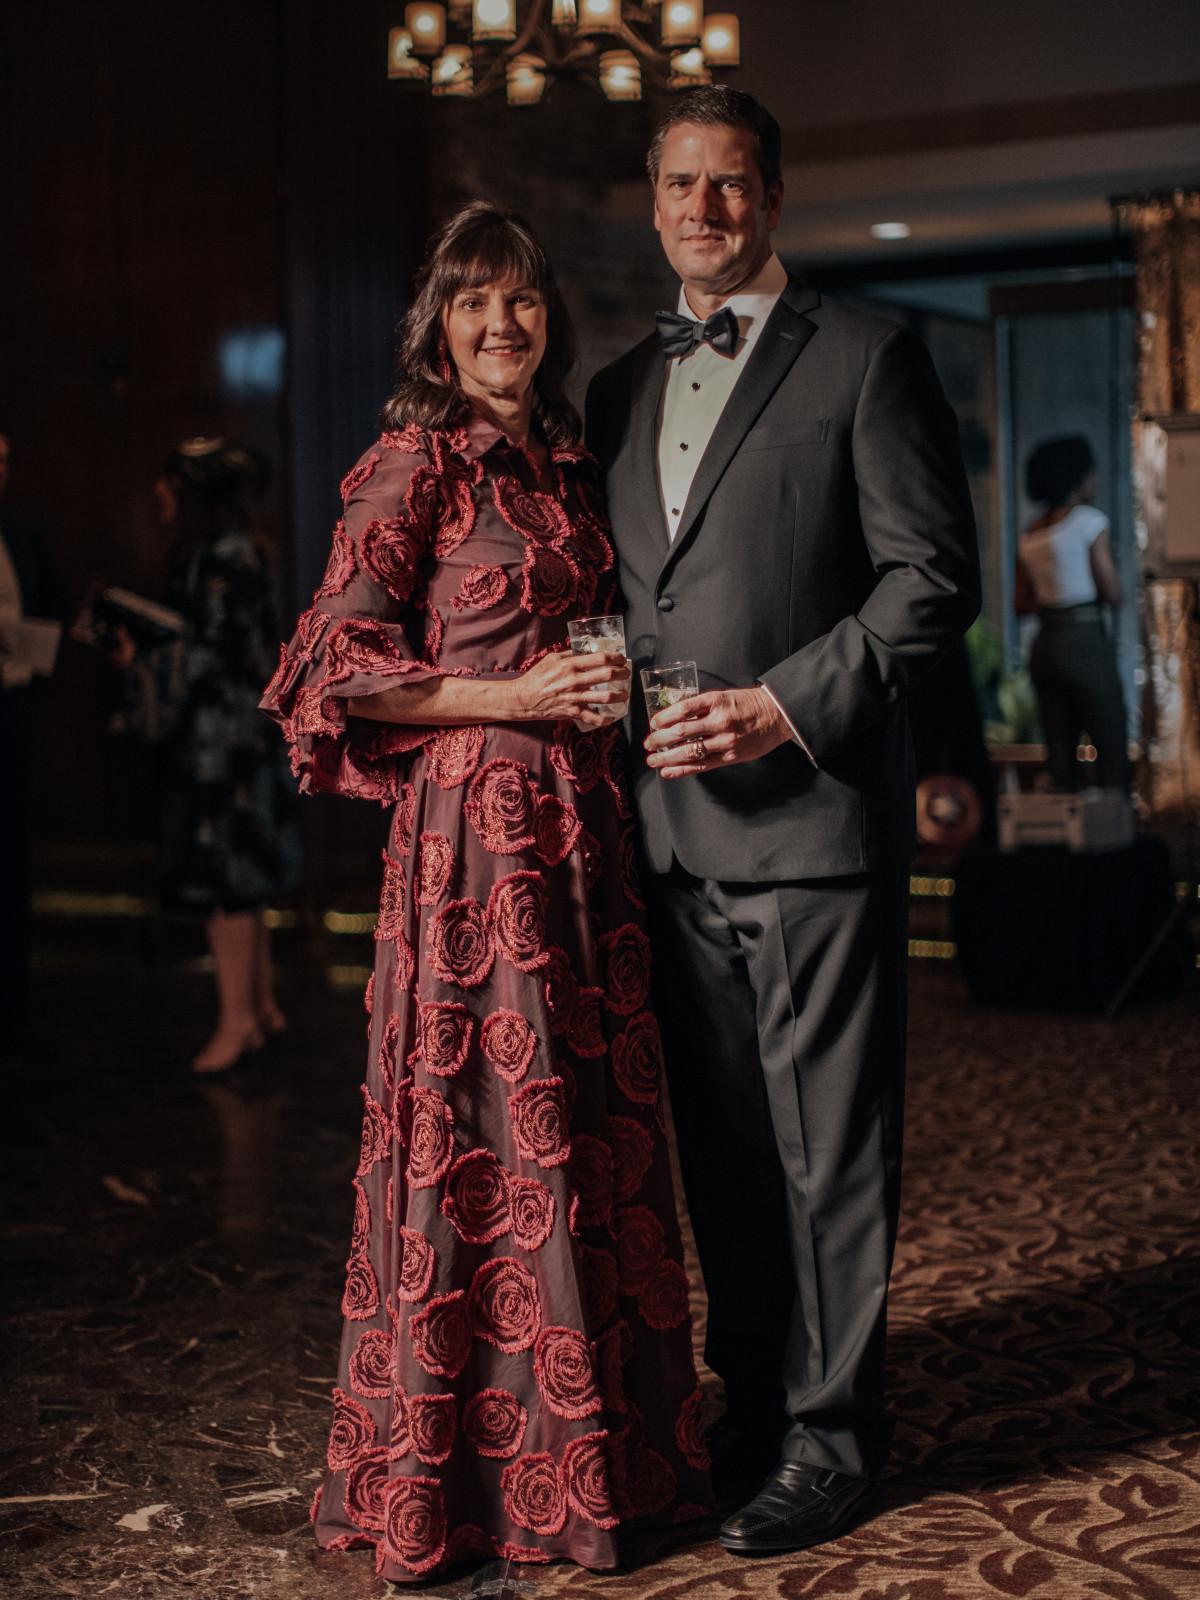 Lisa & Jeff Mangels